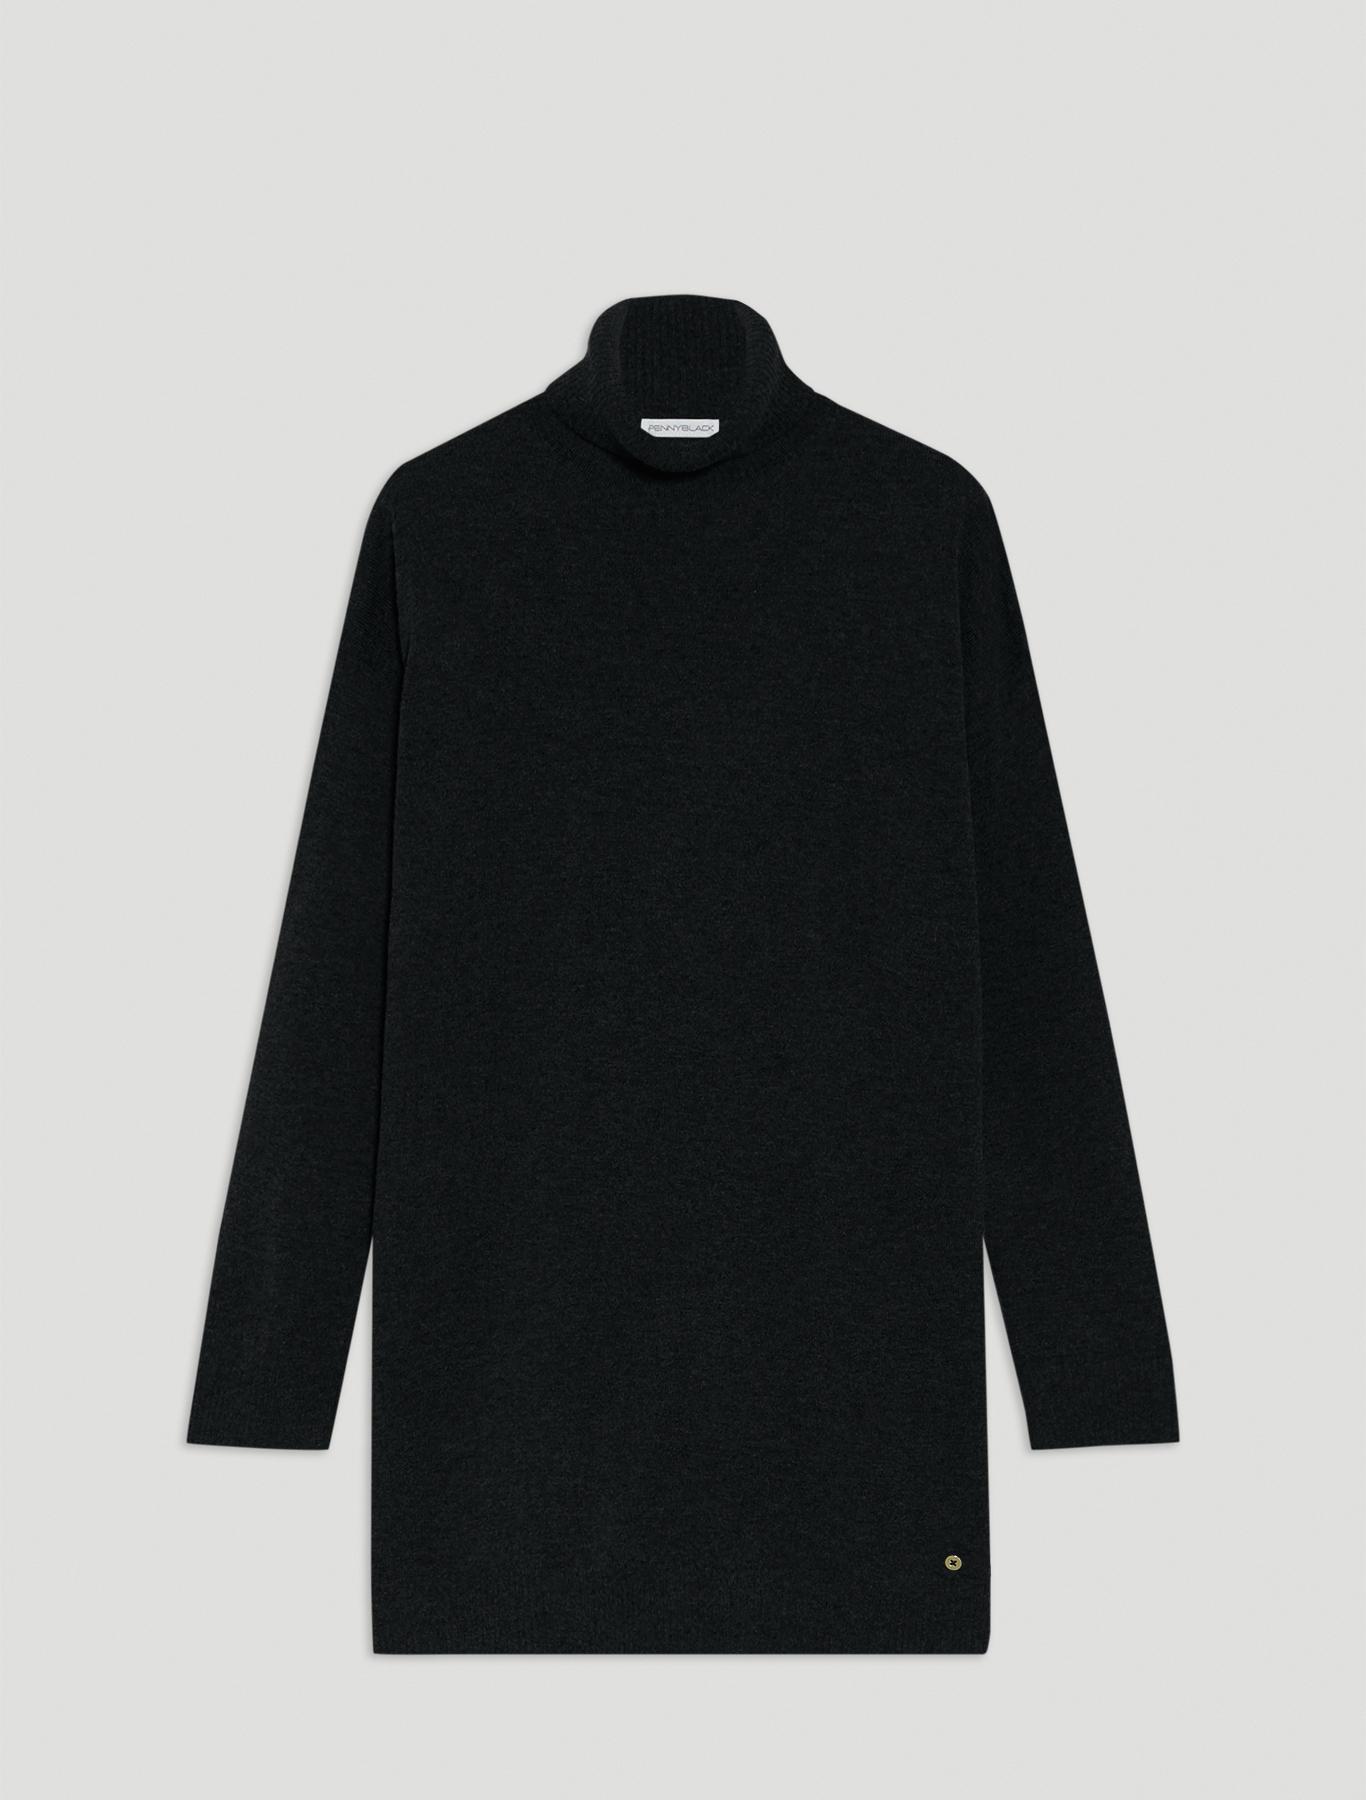 Polo neck jumper with slits - black - pennyblack